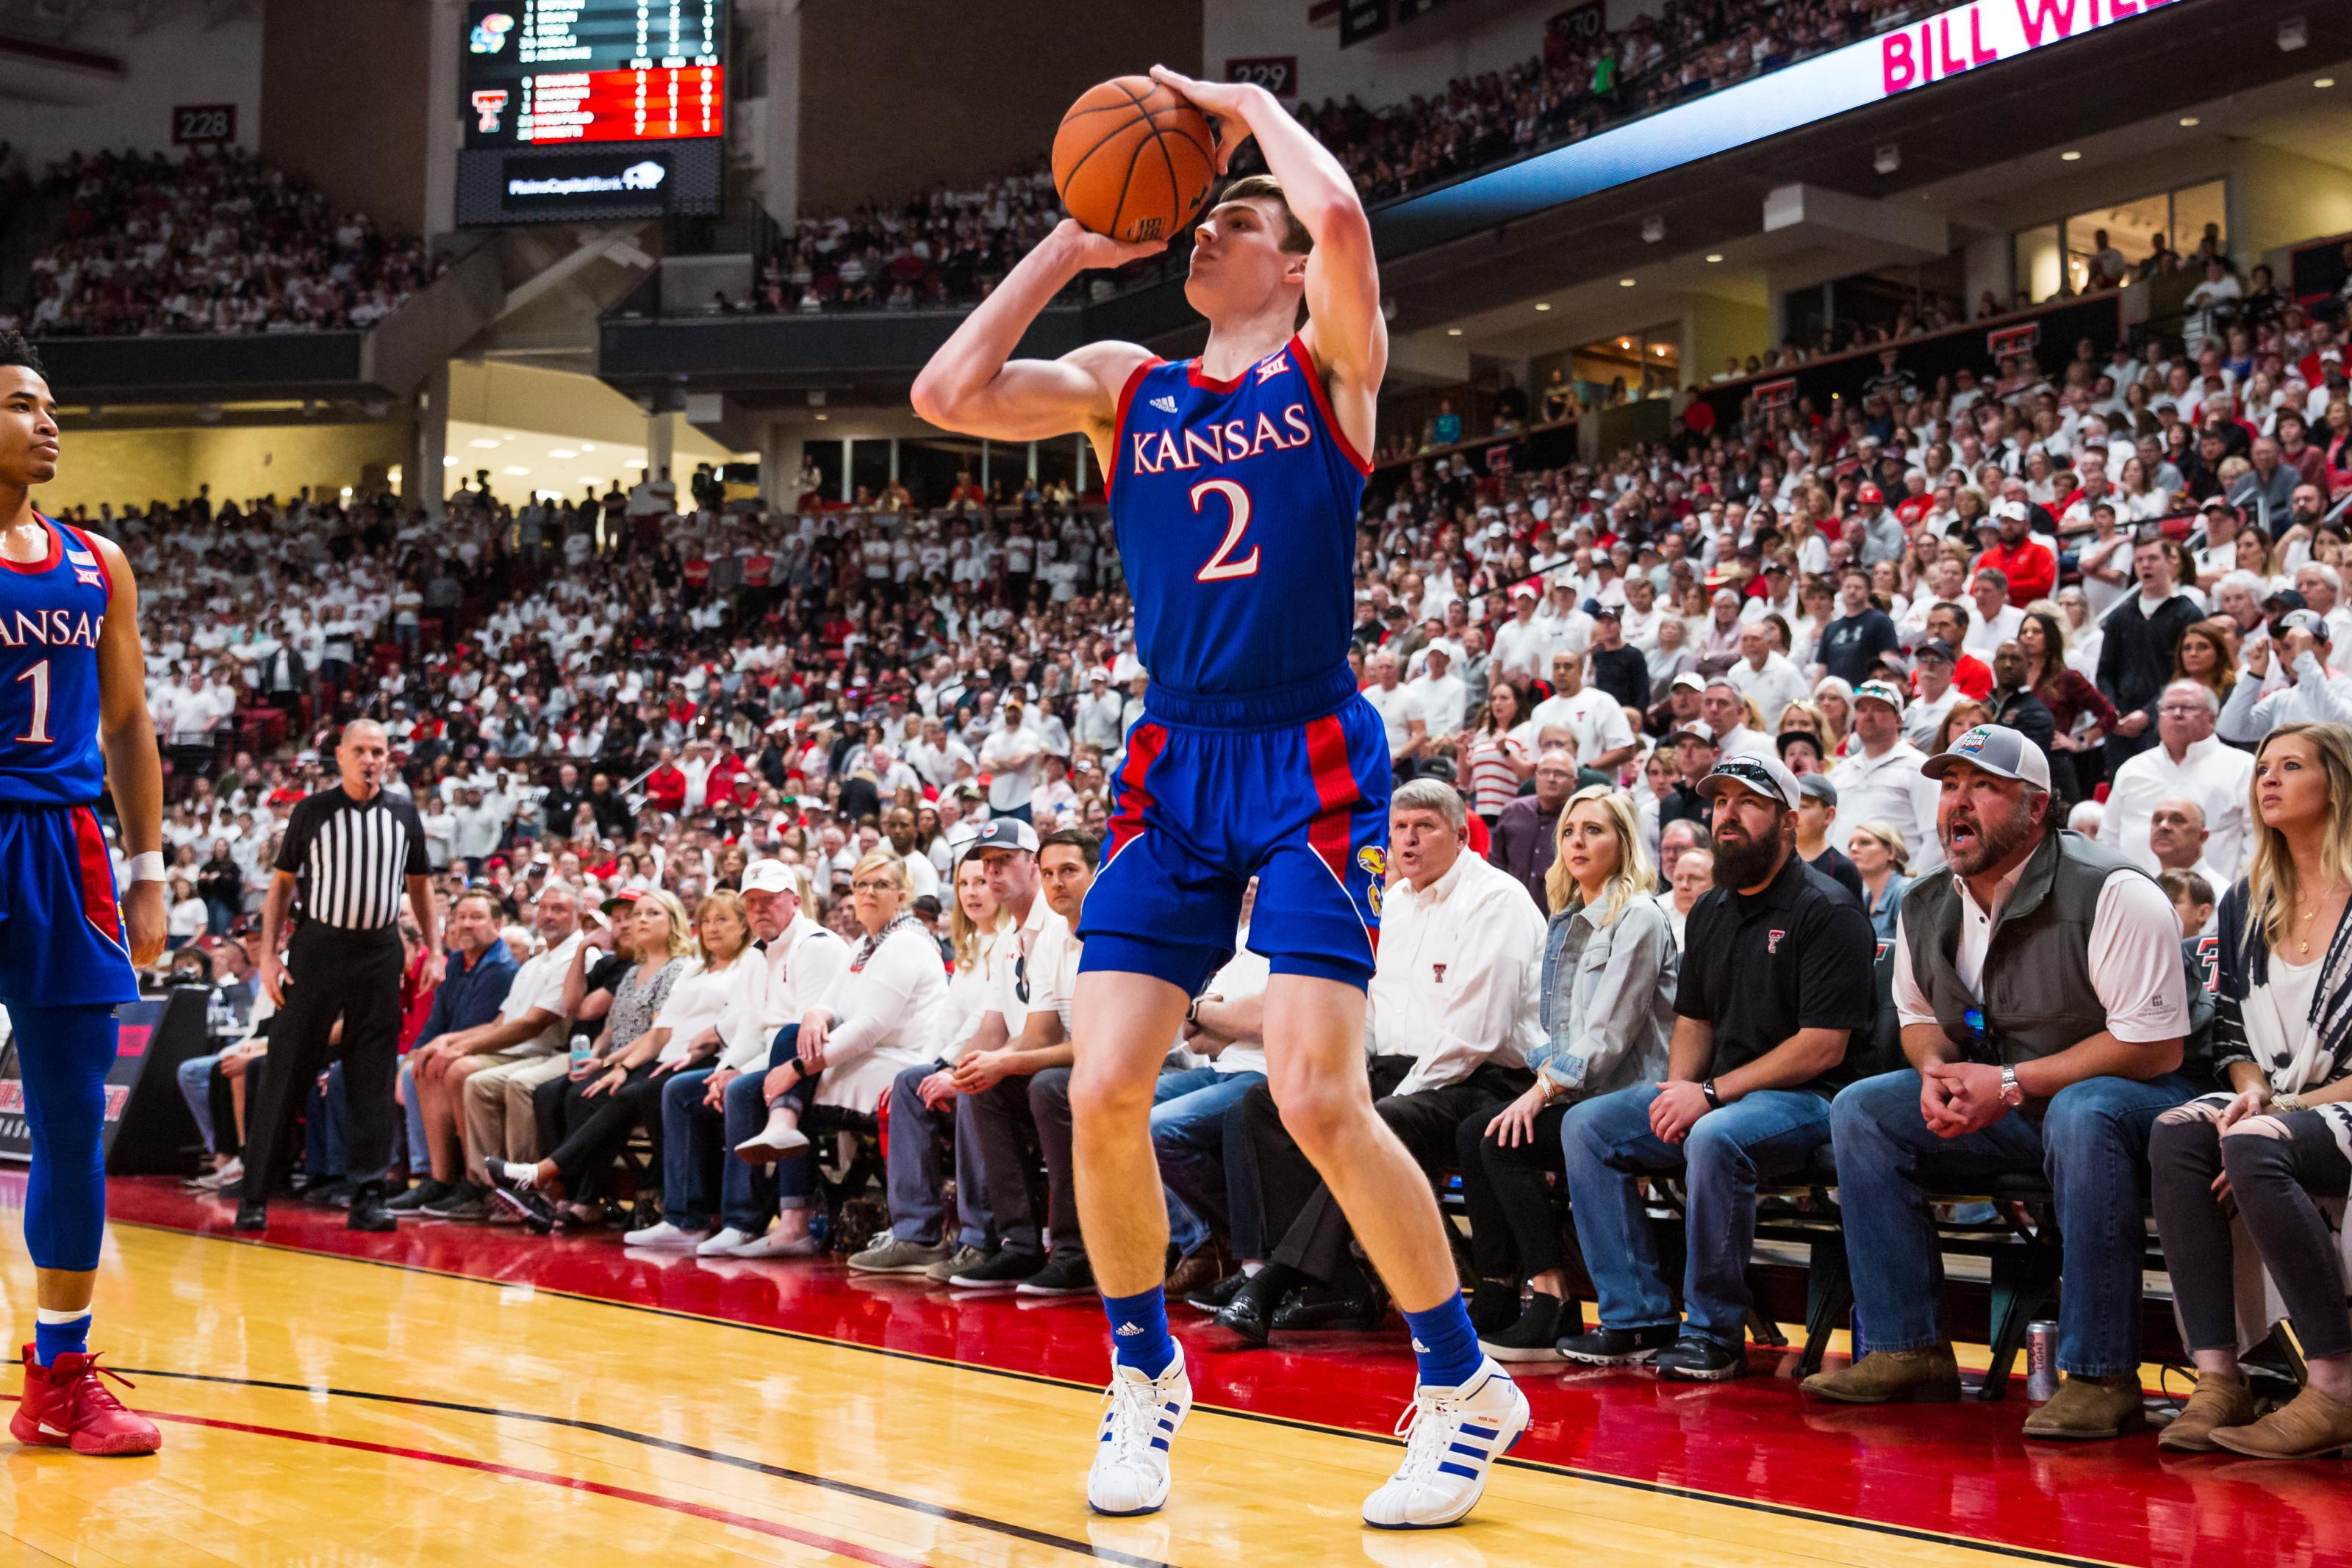 Kansas basketball: Assessing Christian Braun's role next season